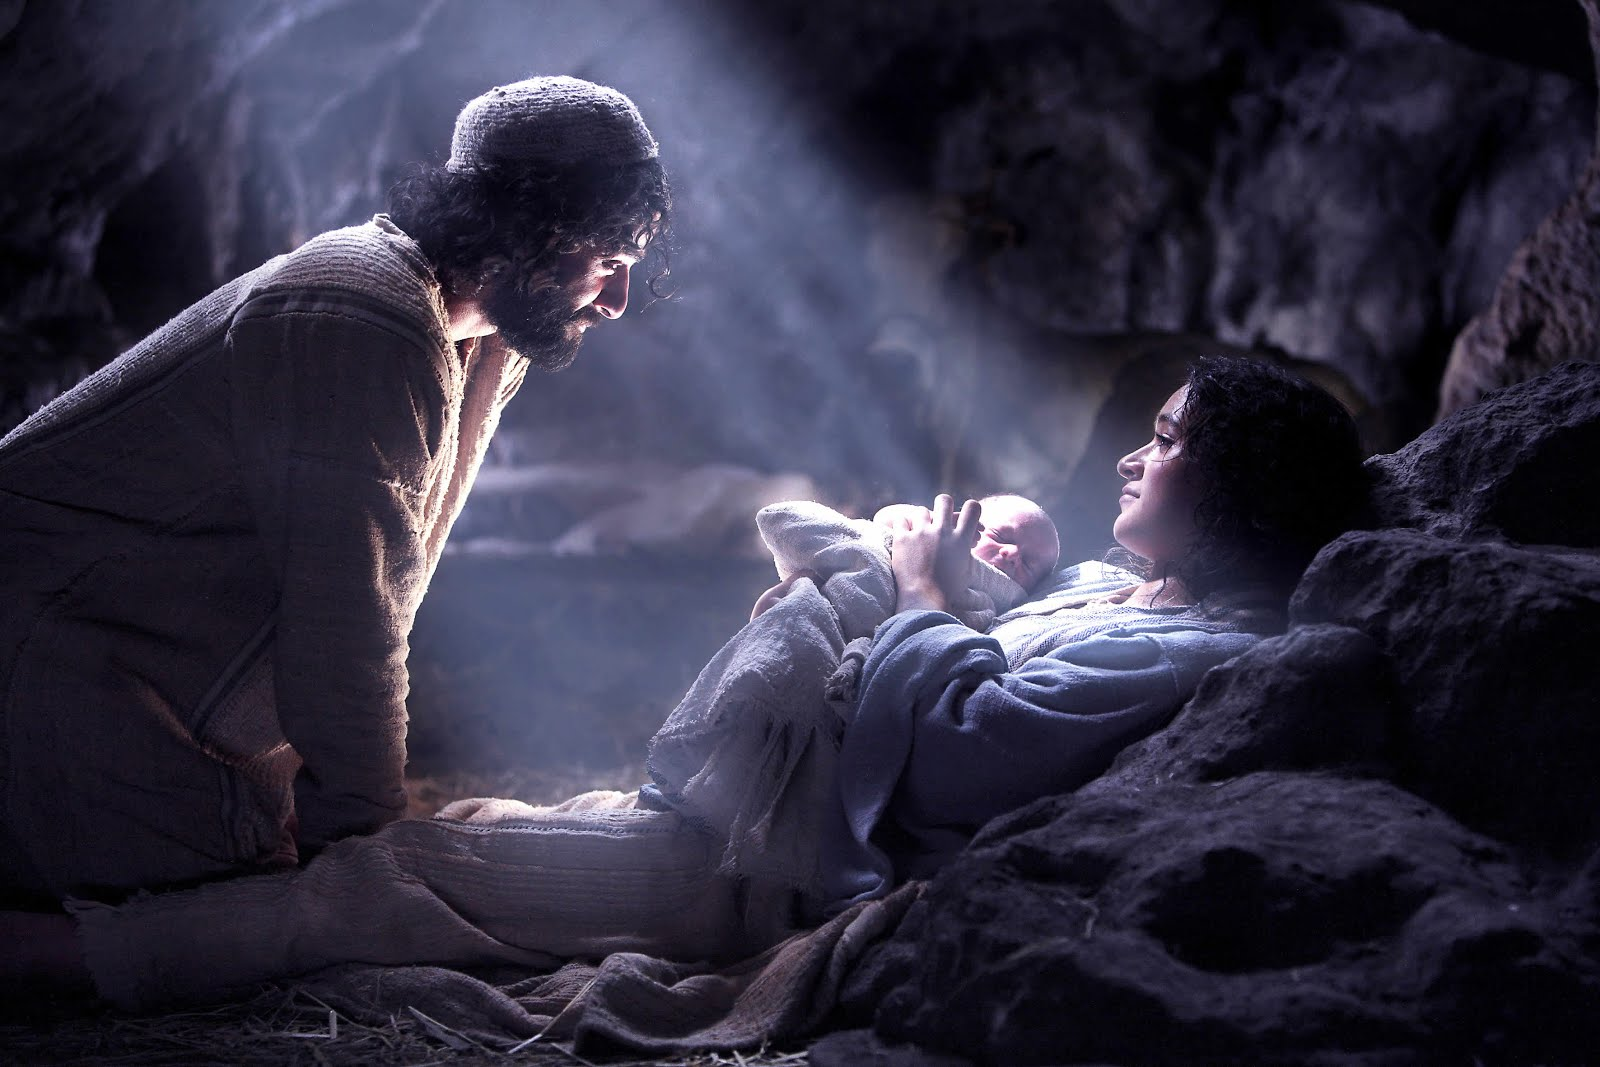 Merry Christmas From Nw Spiritism Nwspiritism